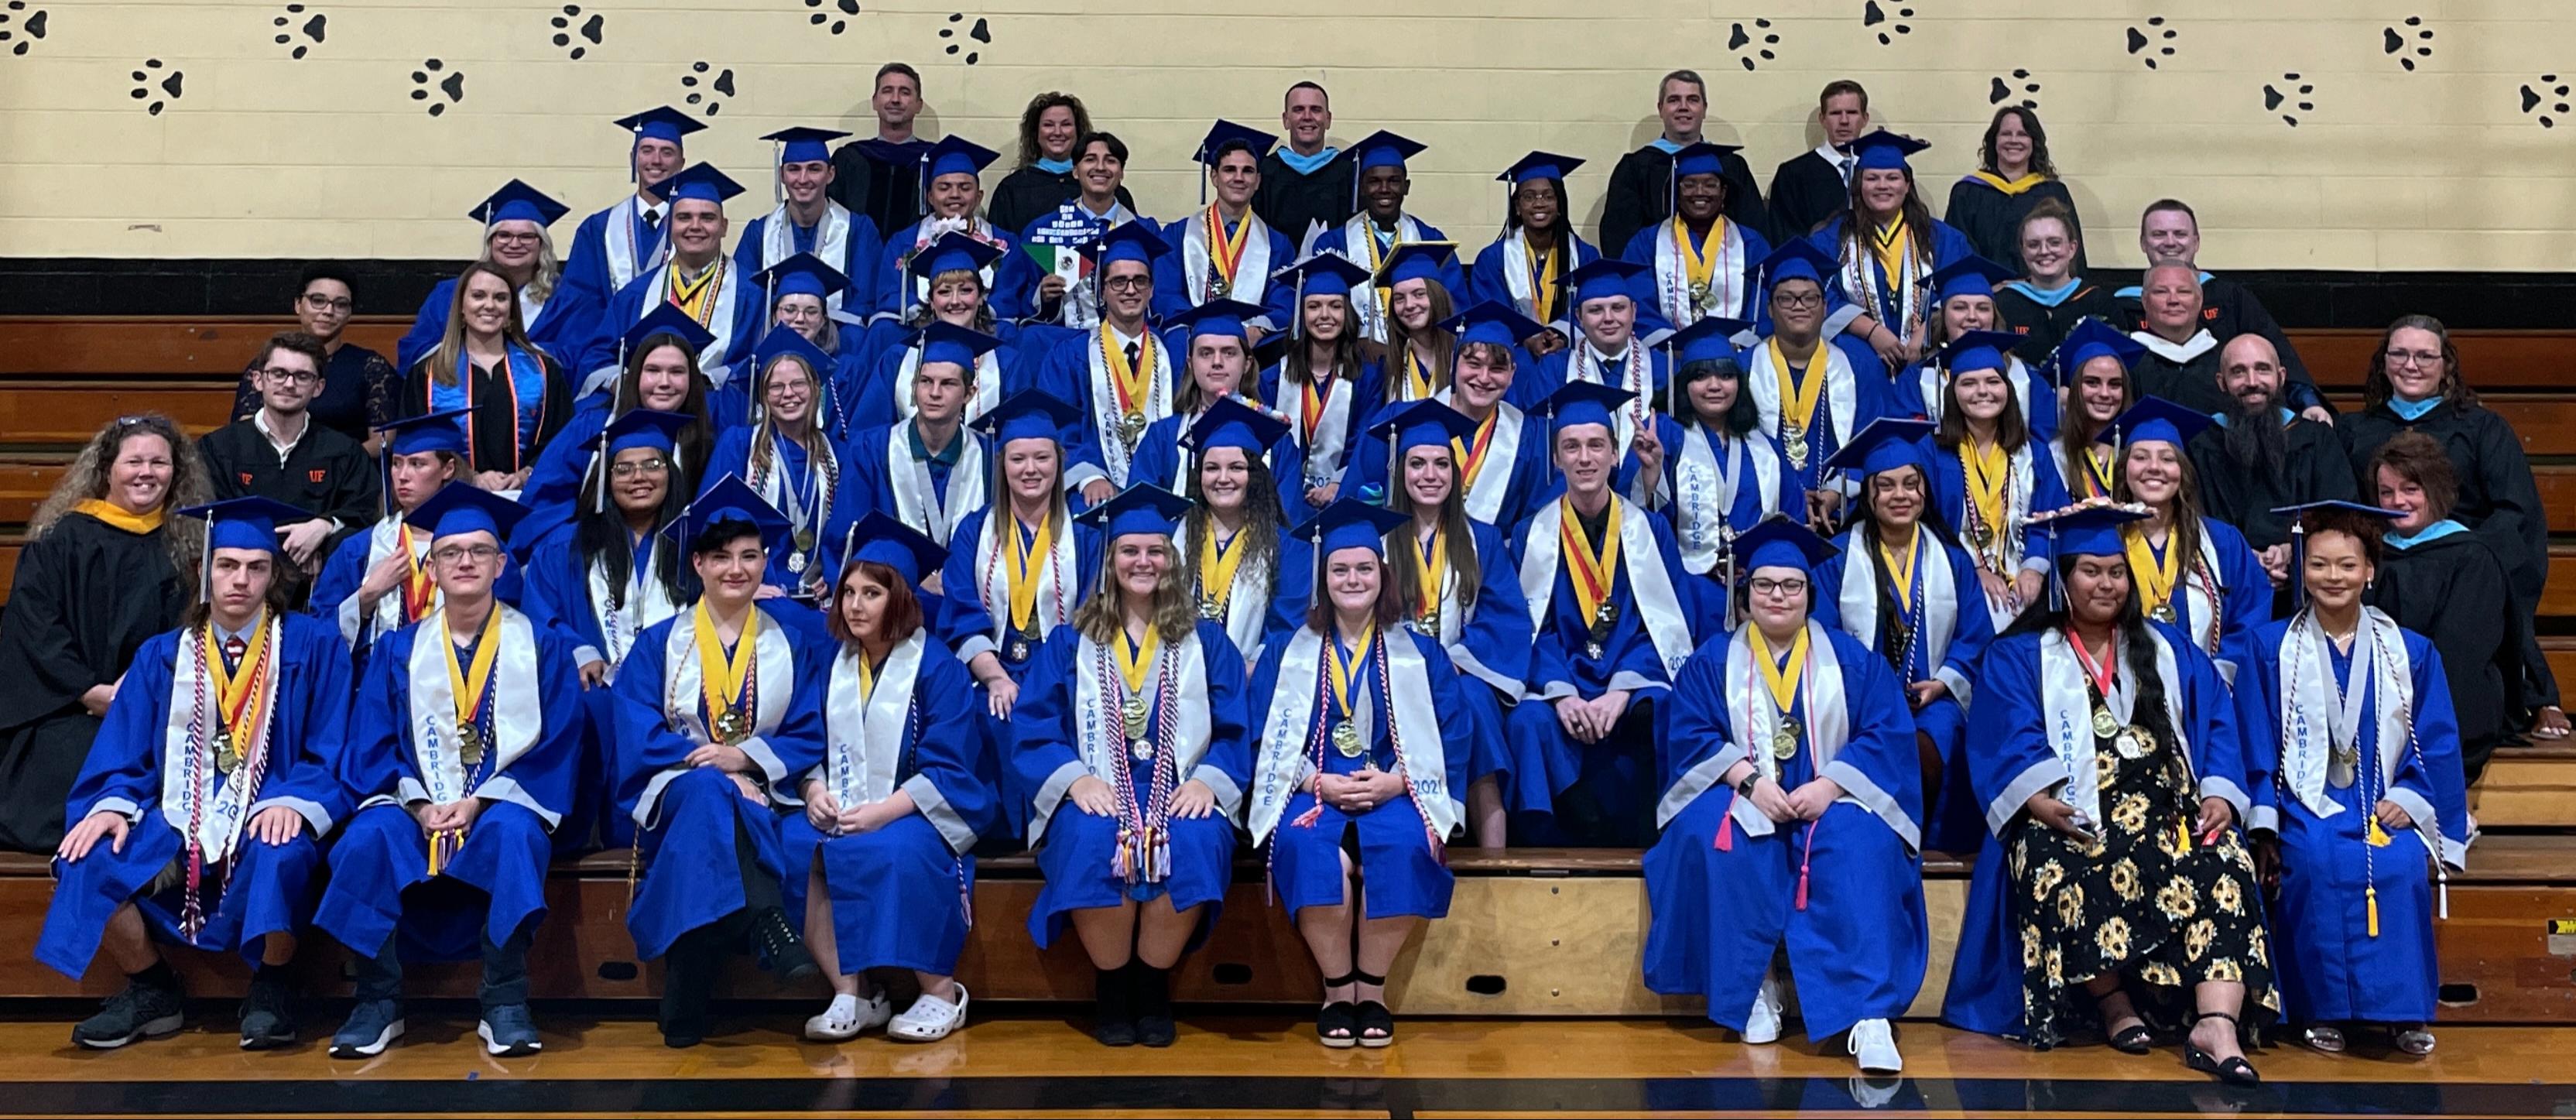 Senior class and staff